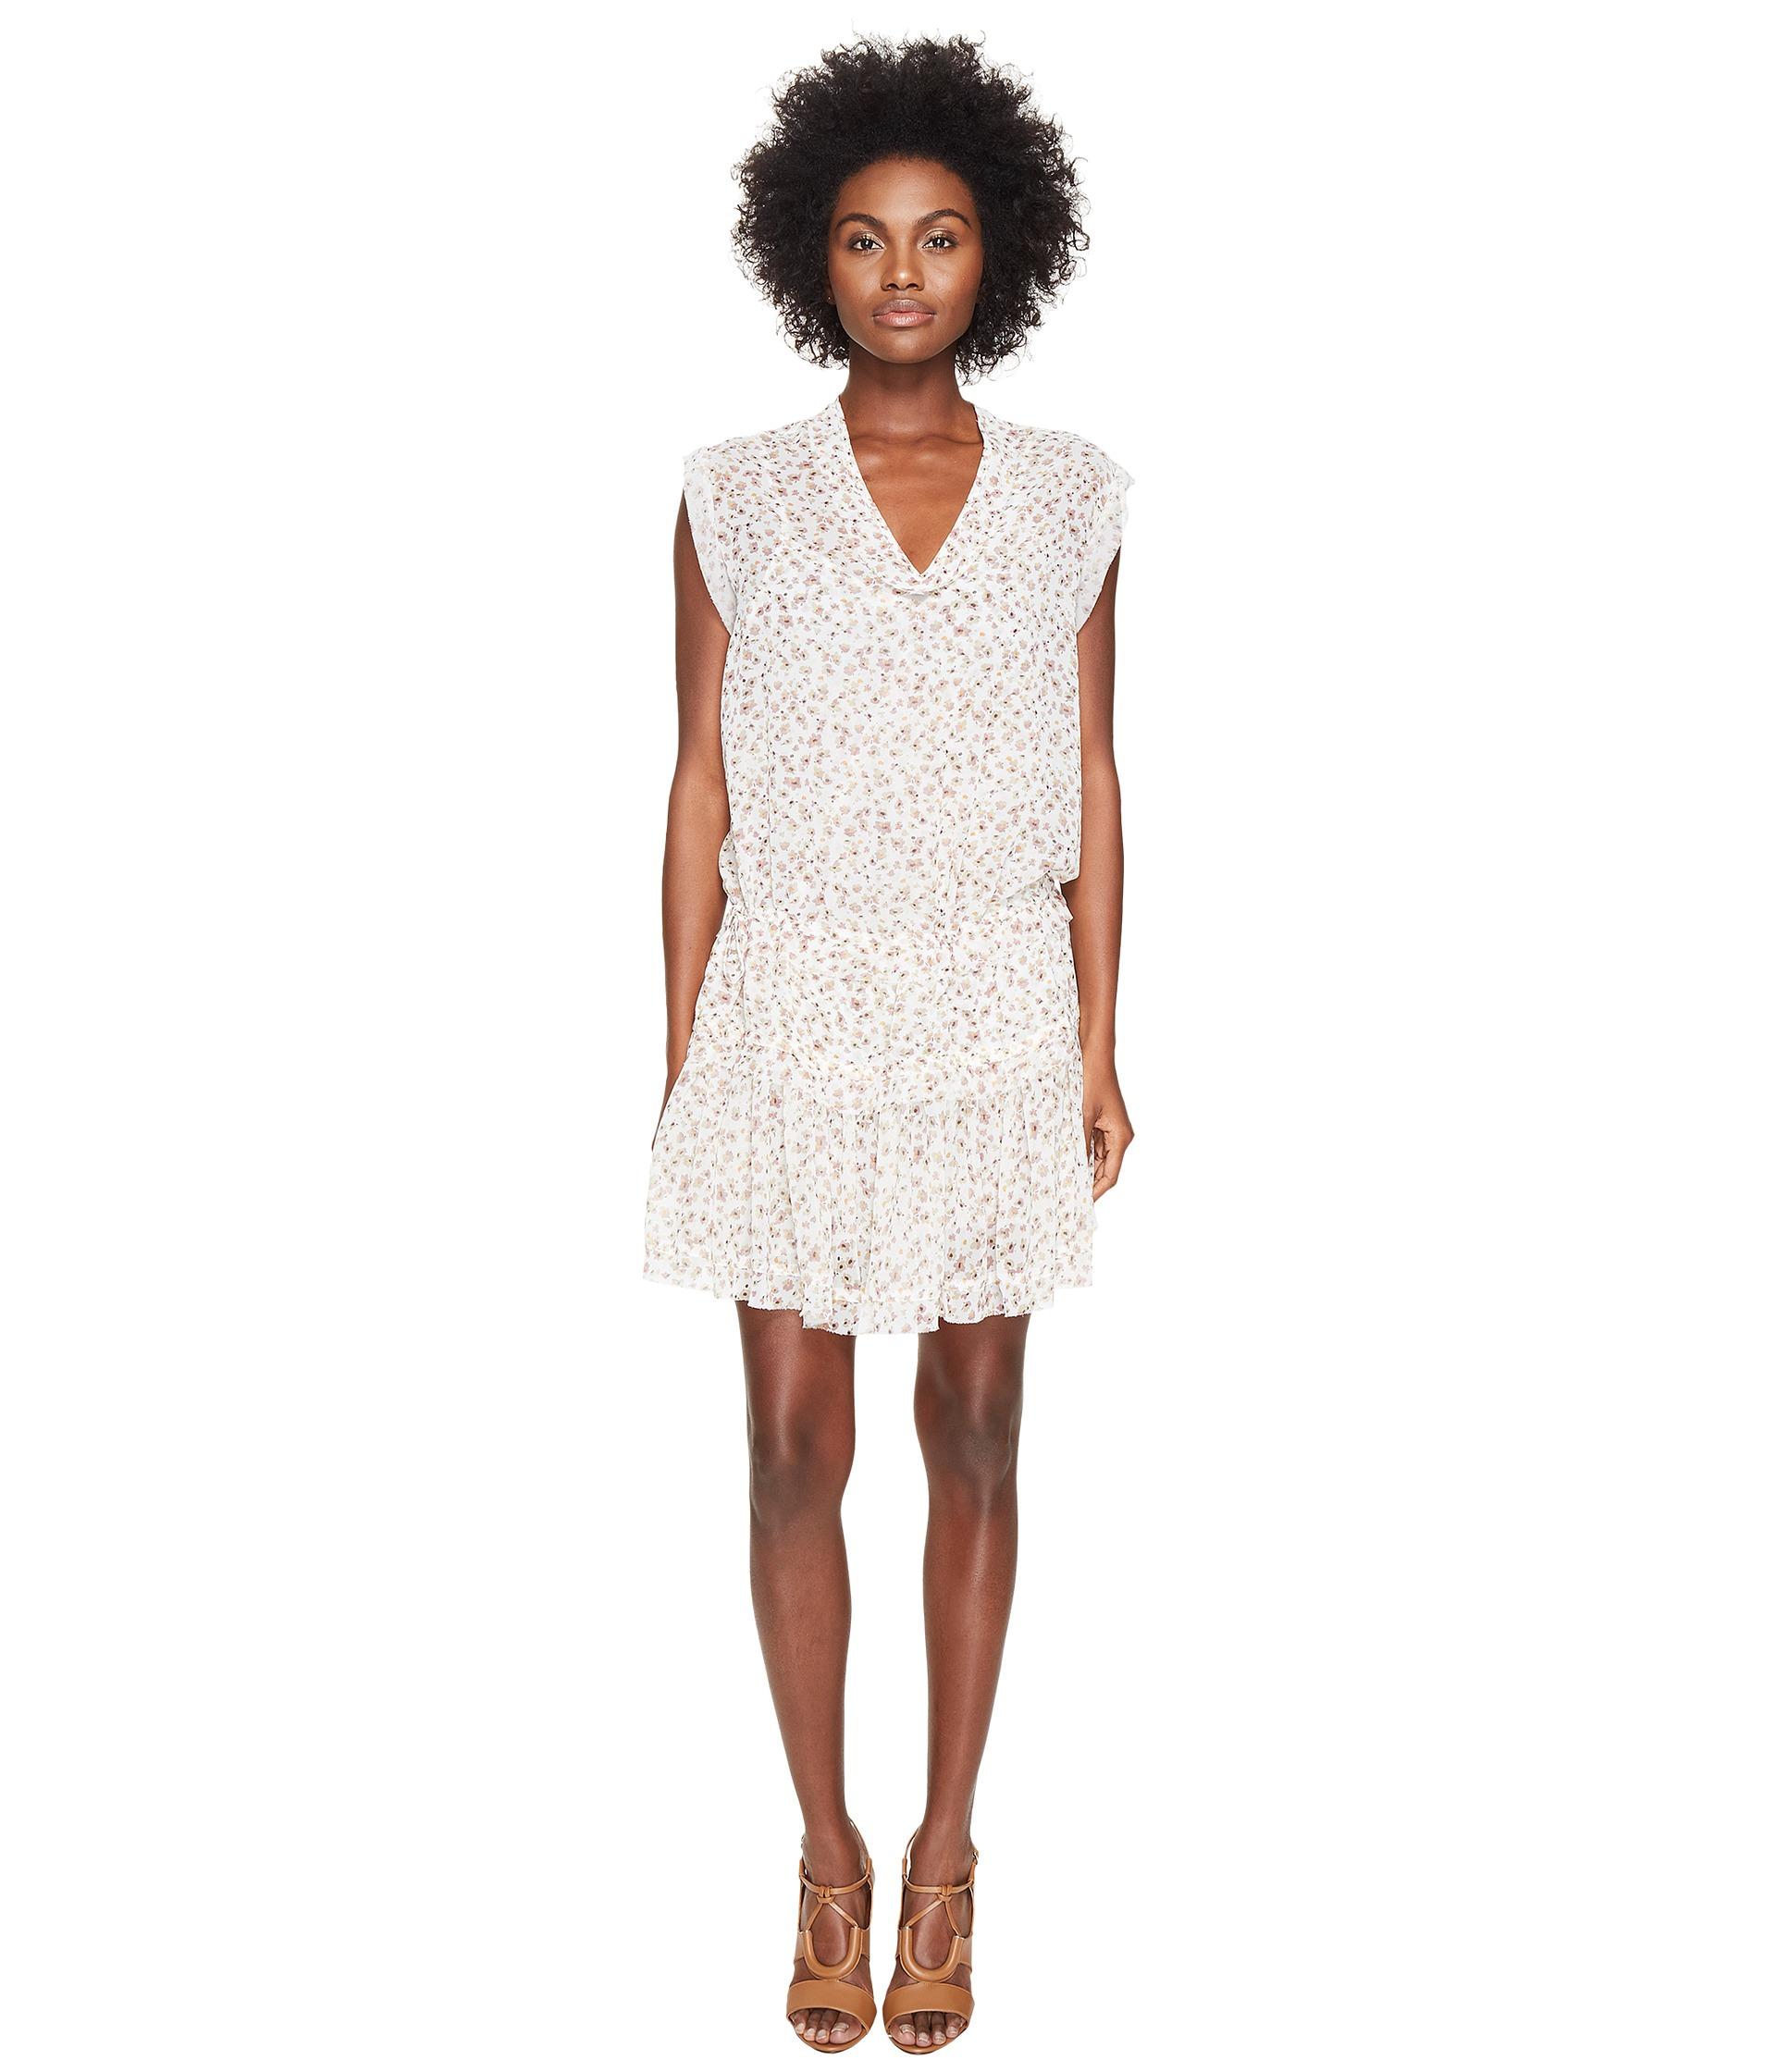 Floral Maxi Dress- Clothing - Shipped Free at Zappos